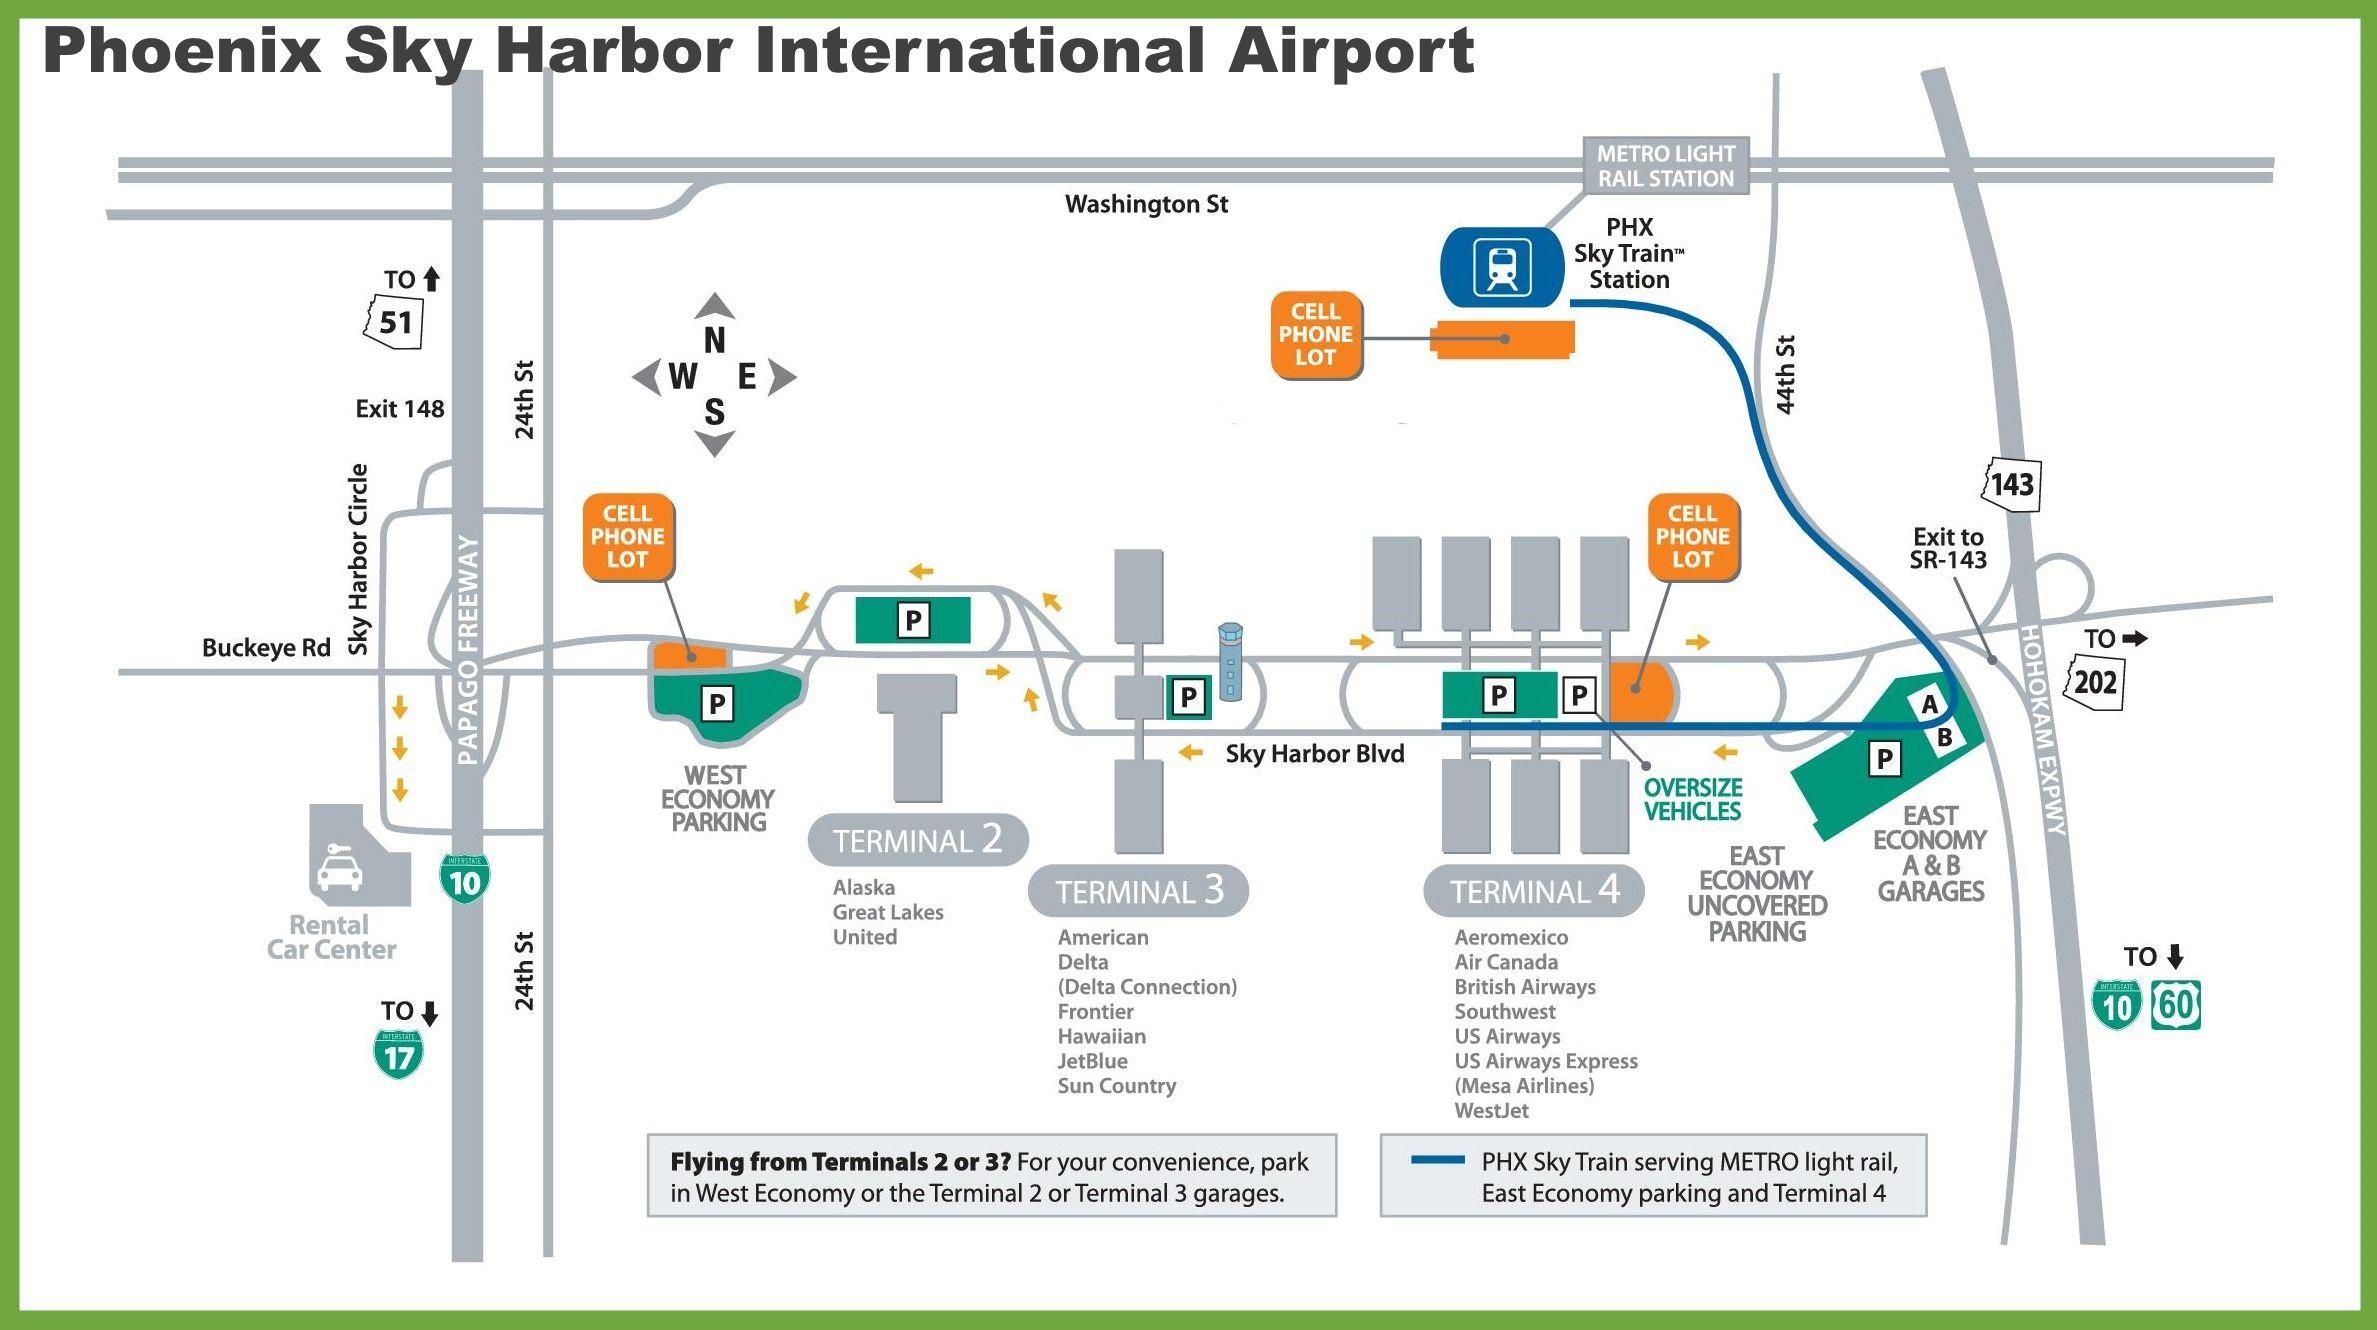 phx map terminal 4 Phoenix Sky Harbor International Airport Map Airport Map Phoenix Sky Harbor International Airport Printable Maps phx map terminal 4